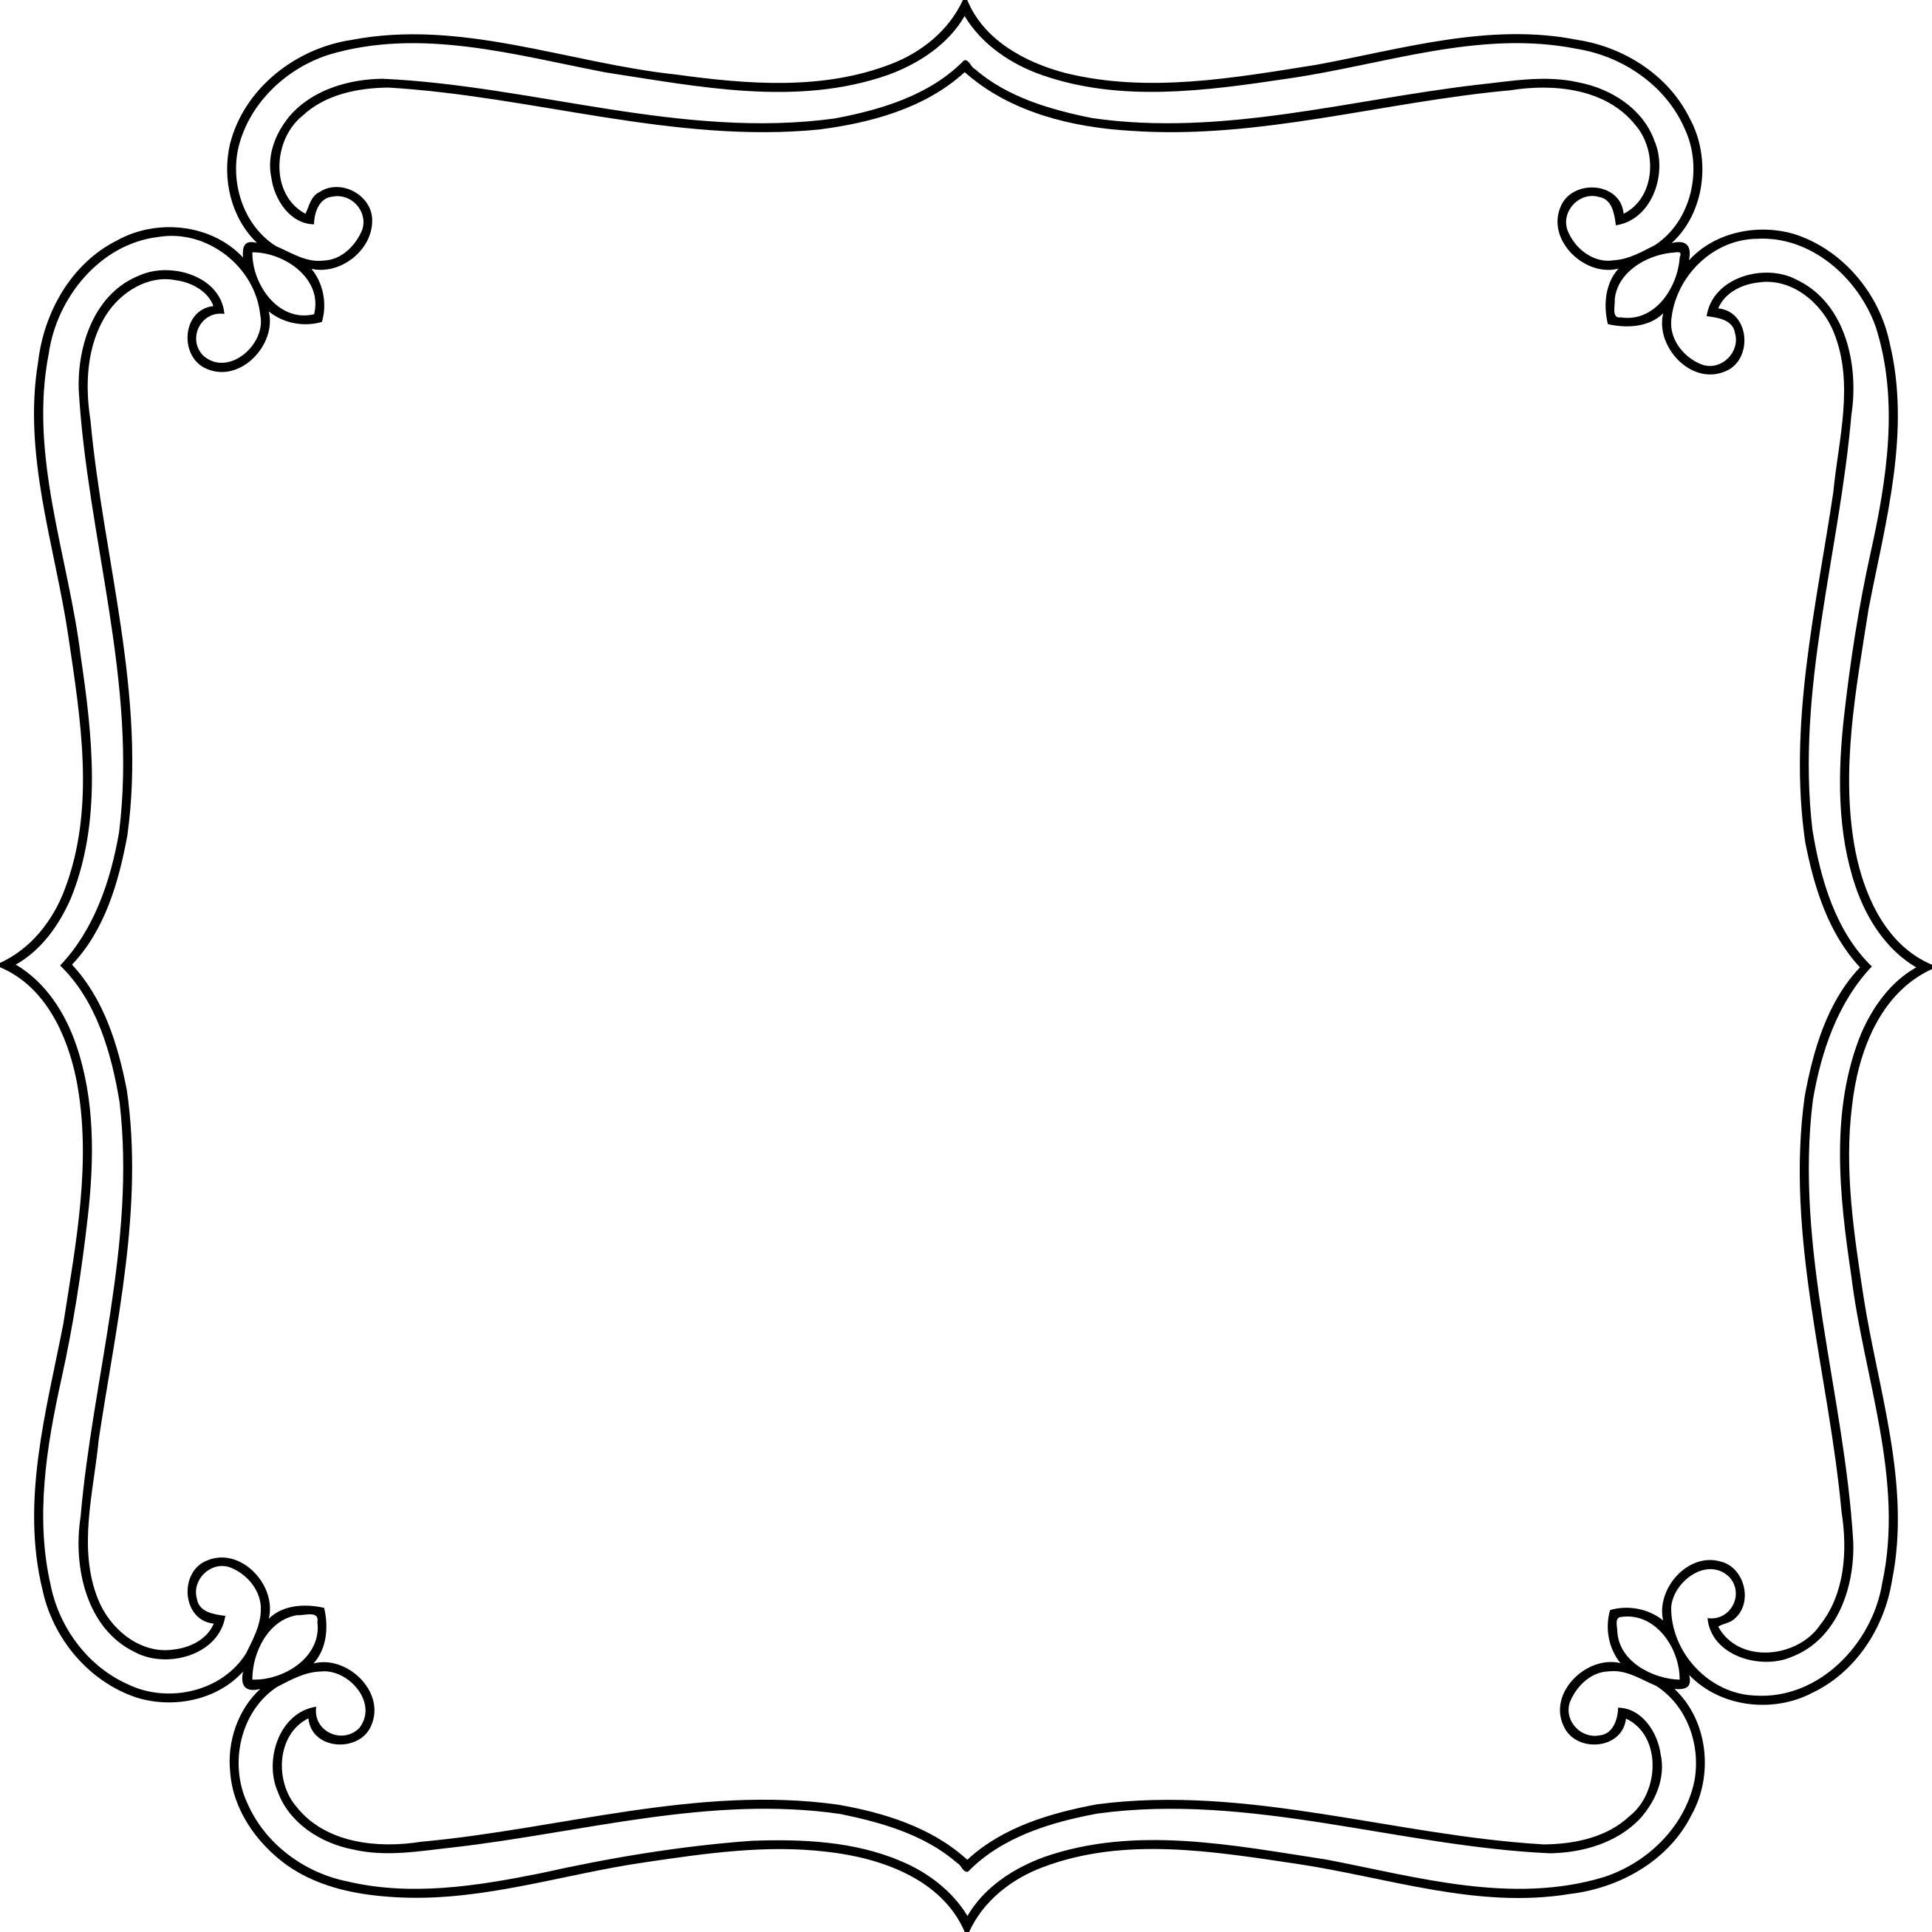 Button clipart ornamental. Frame design droide